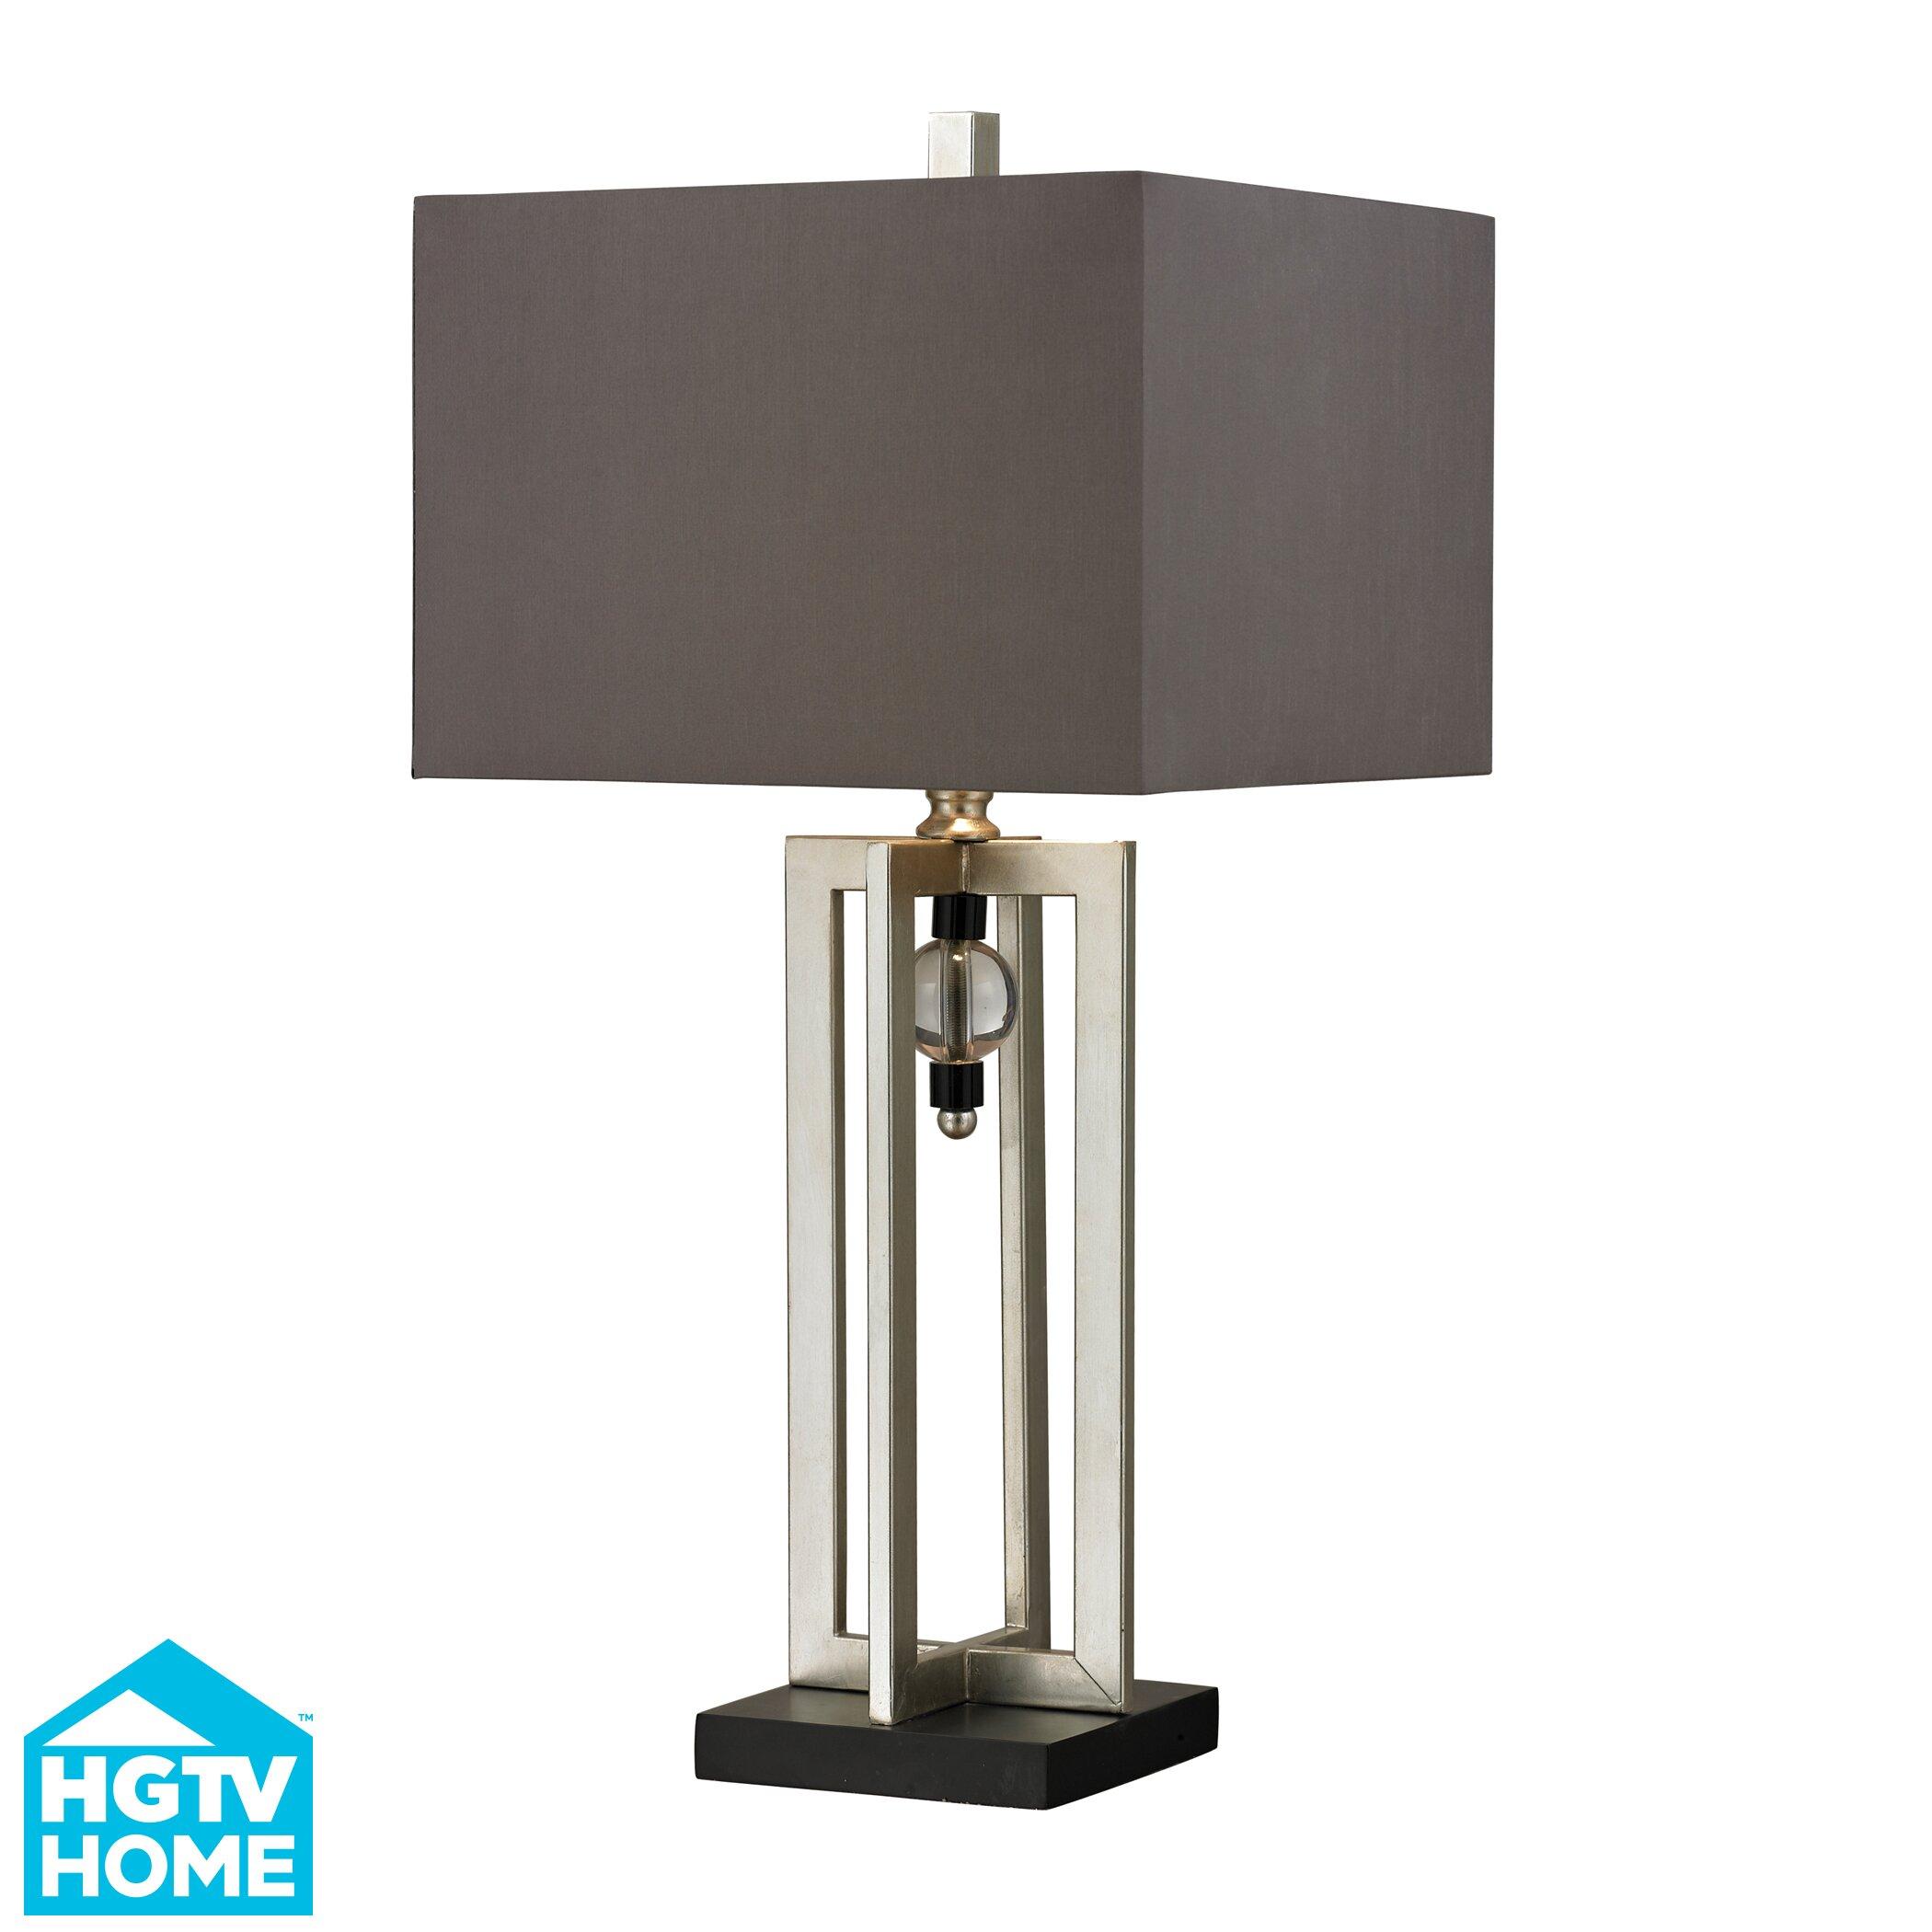 Dimond lighting hgtv home 30 quot table lamp amp reviews wayfair